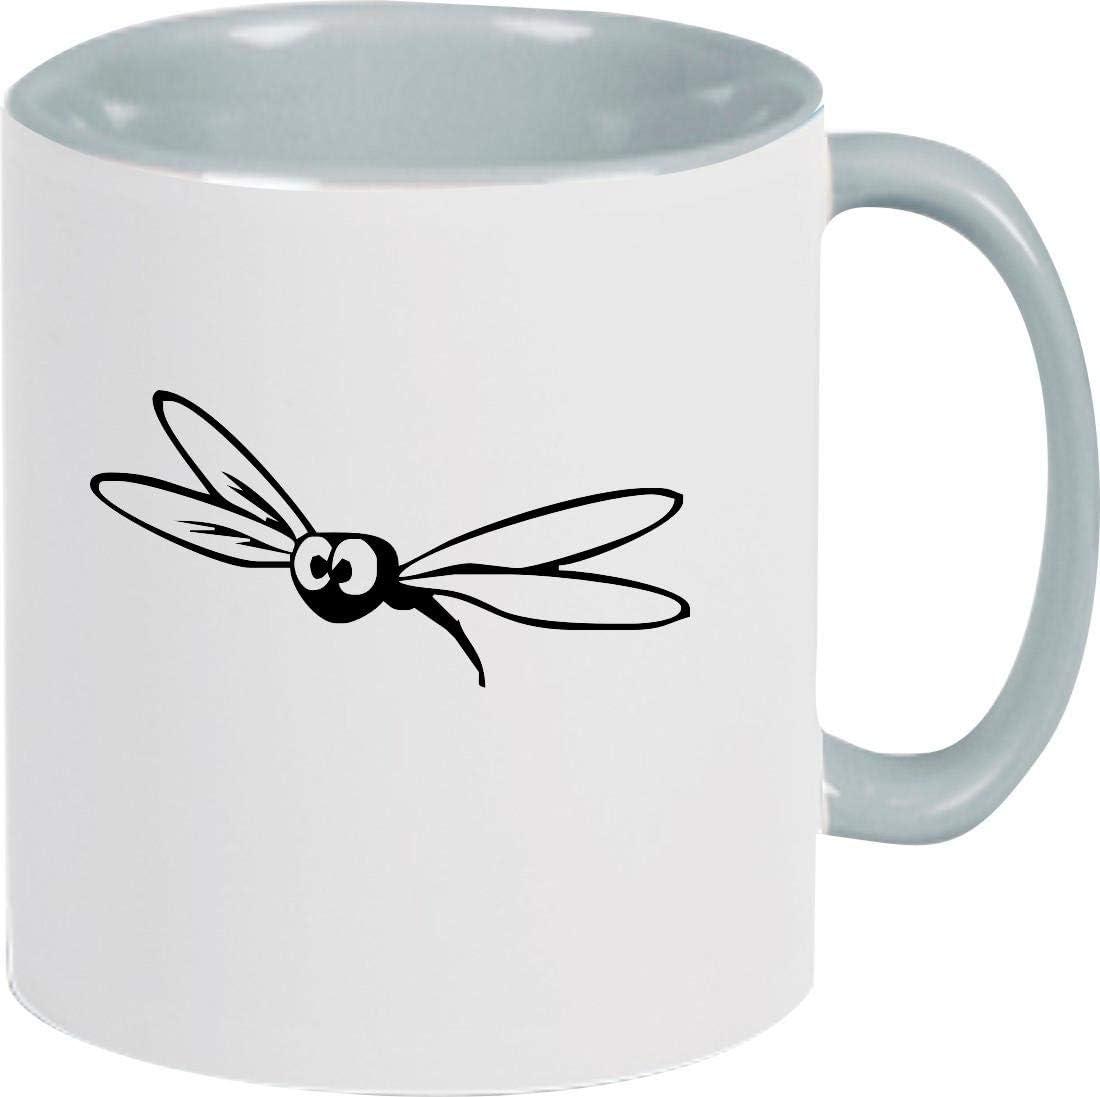 Shirtstown - Taza de café con insecticida, diseño de Animales, cerámica, Gris, 375 ml